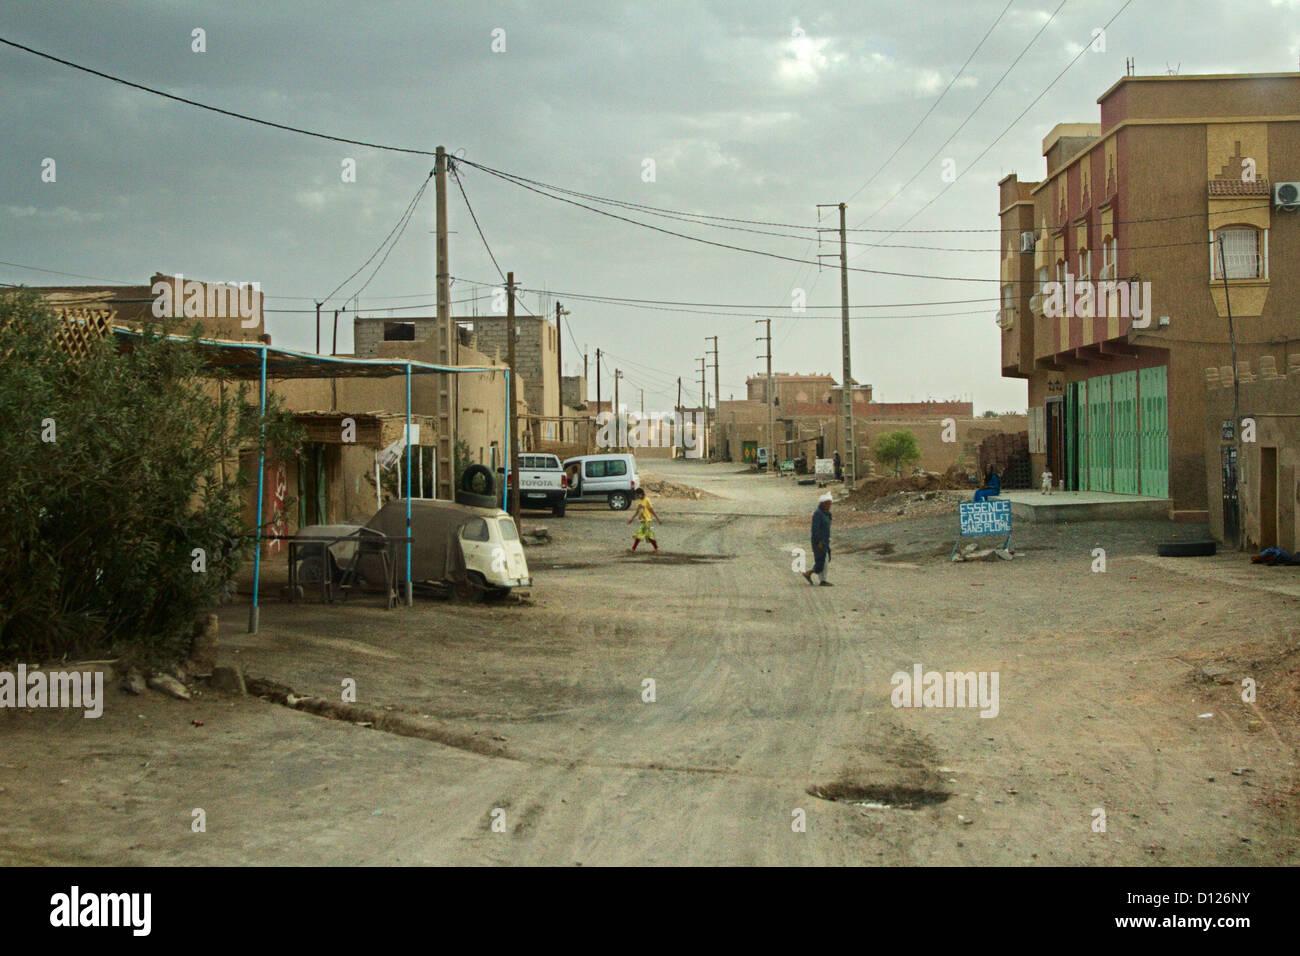 Merzouga, Erg Chebbi, Sahara, Morocco, Street - Stock Image